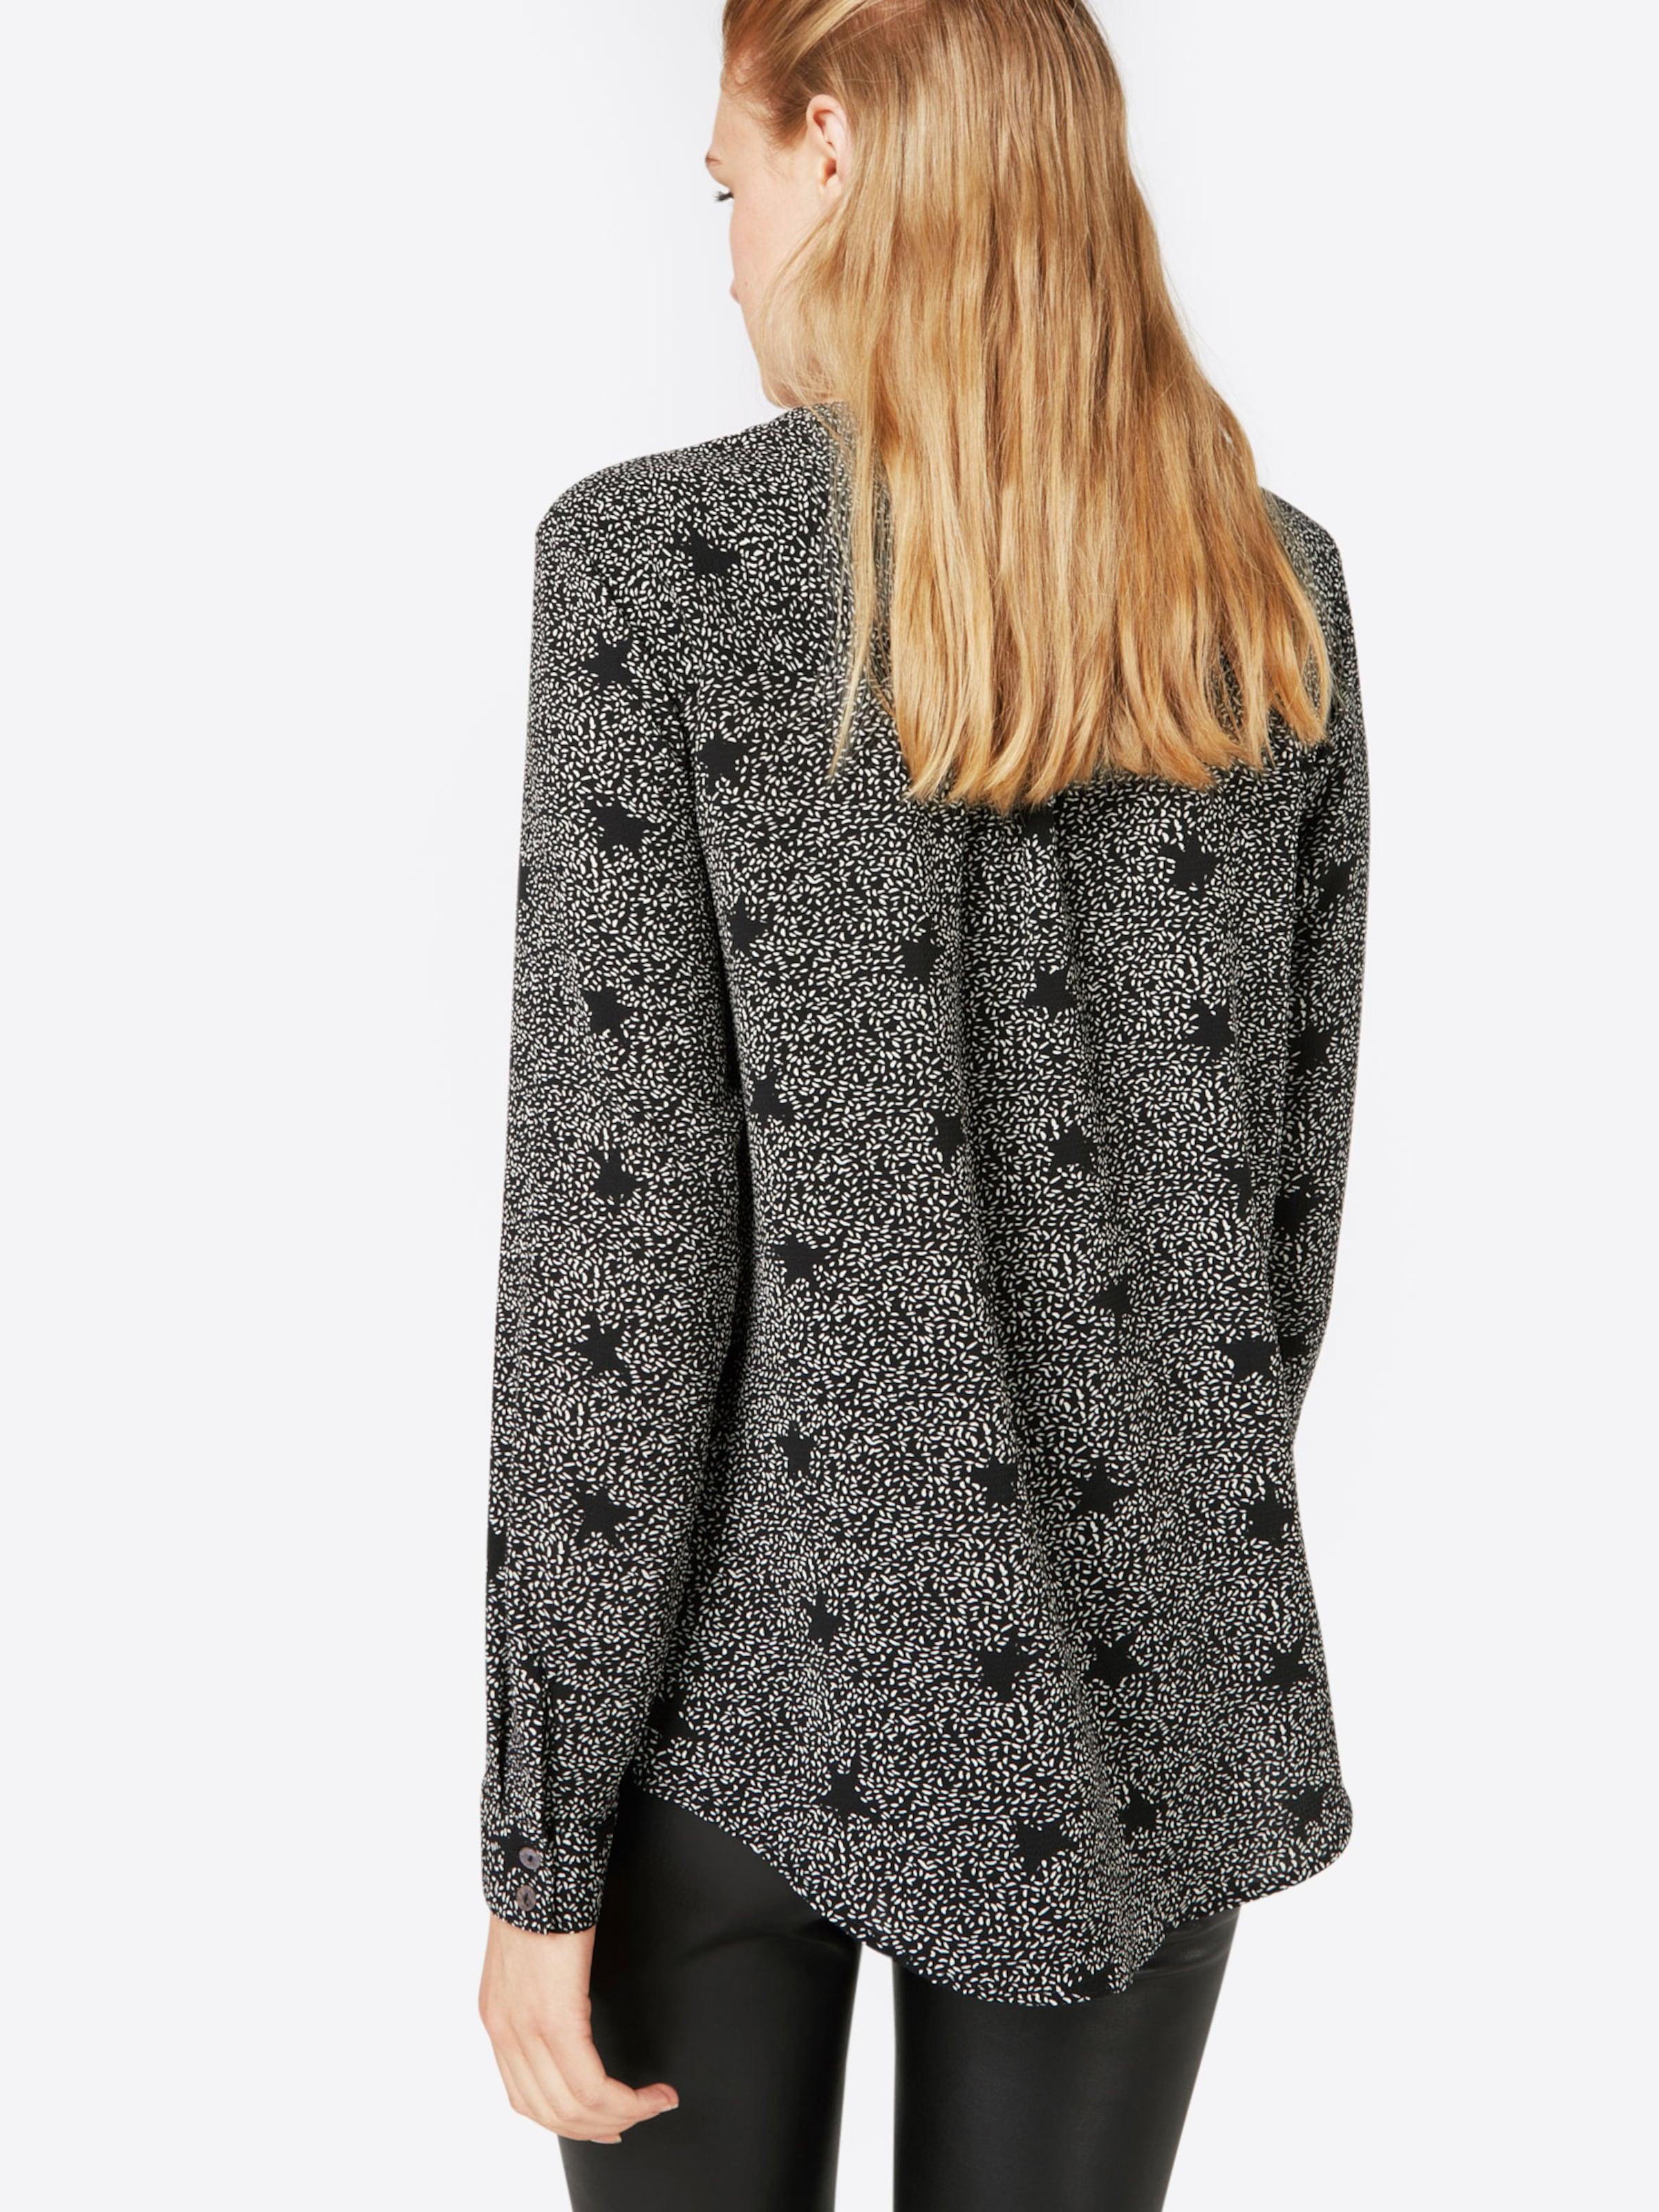 JACQUELINE de YONG Bedrucktes Langarmhemd Billig Verkauf Offiziell 91C2hv0PTK